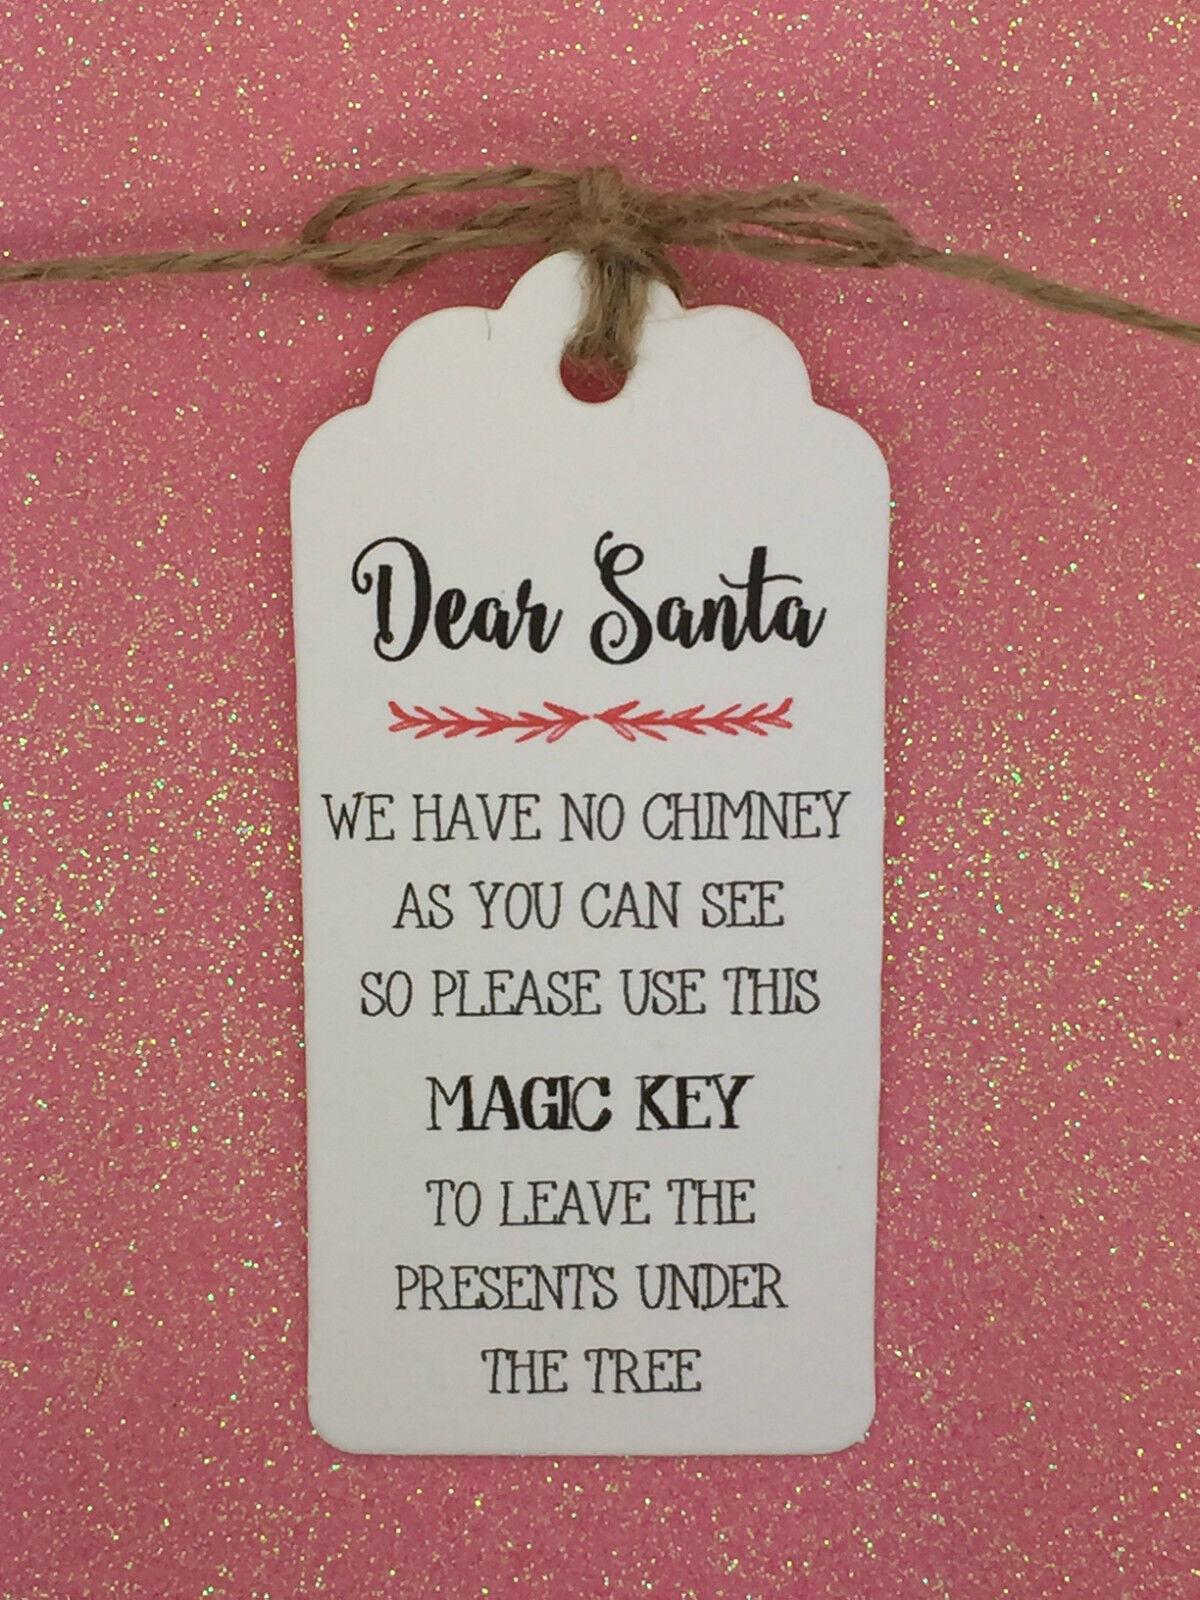 SANTA magic key POESIA-CARTOLINA DI NATALE Etichetta Regalo da regalo, Natale Festa Regalo Etichetta Albero Tie 9df1d0